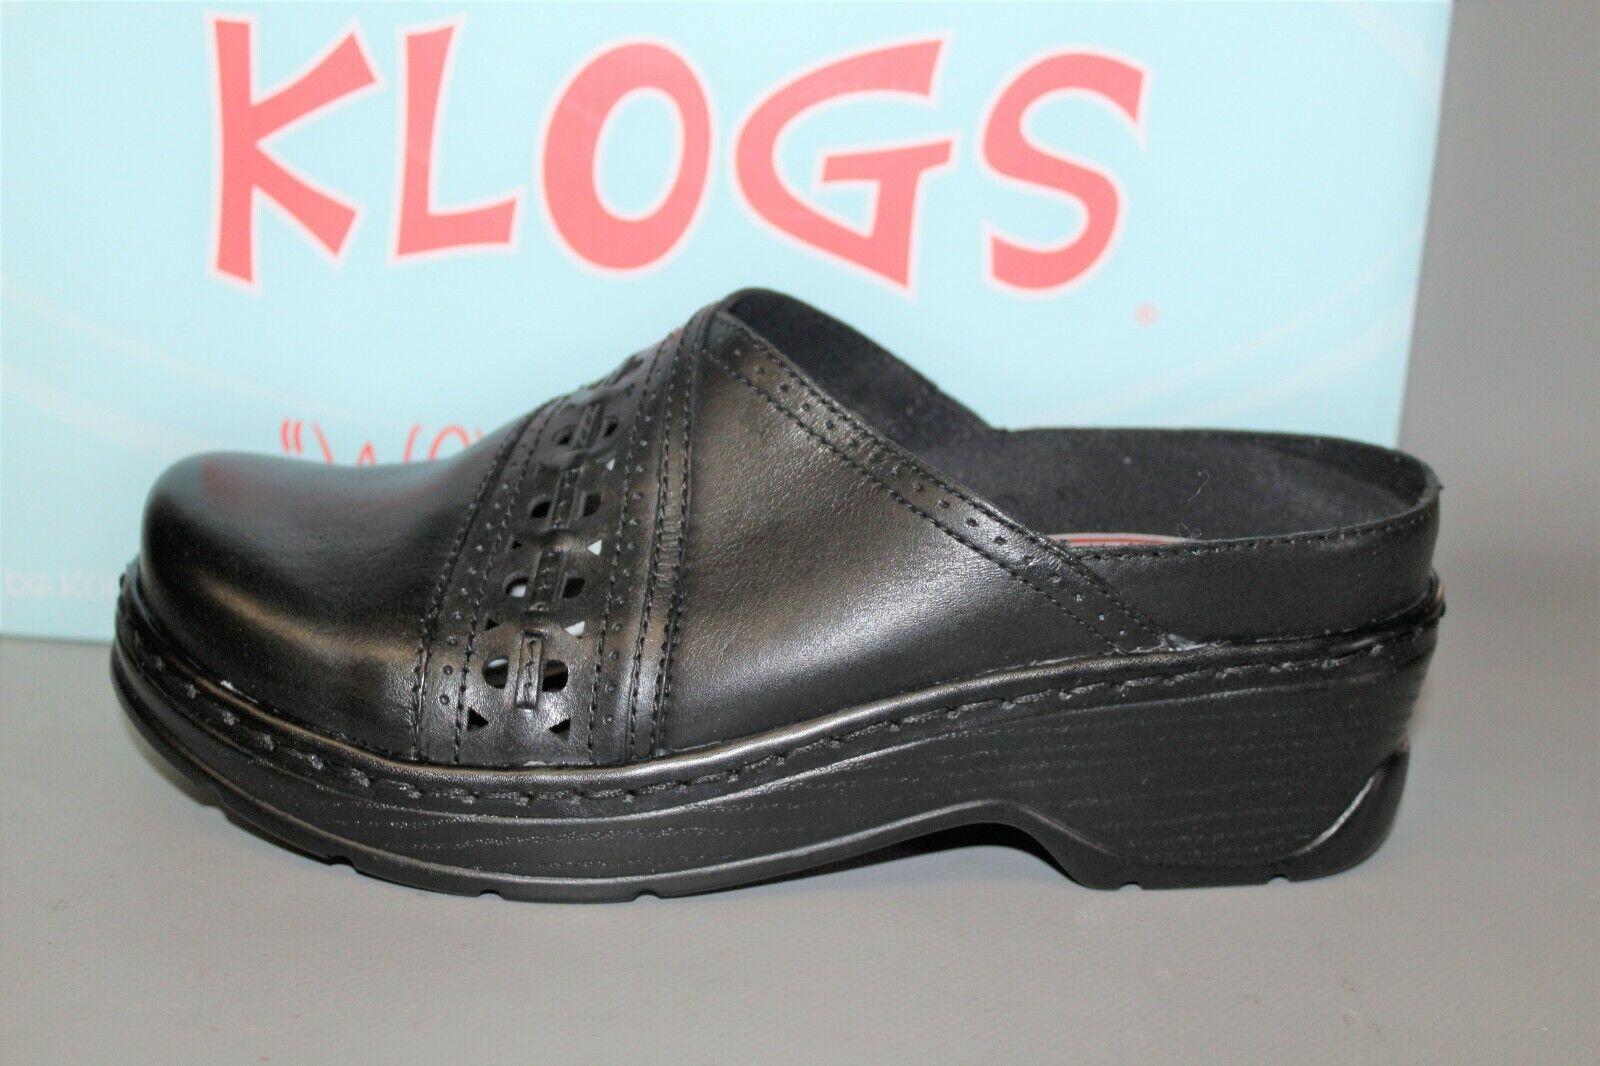 Wouomo Klogs Syracuse Dimensione 10 Medium nero Comfortable, Supportive Casual Clog